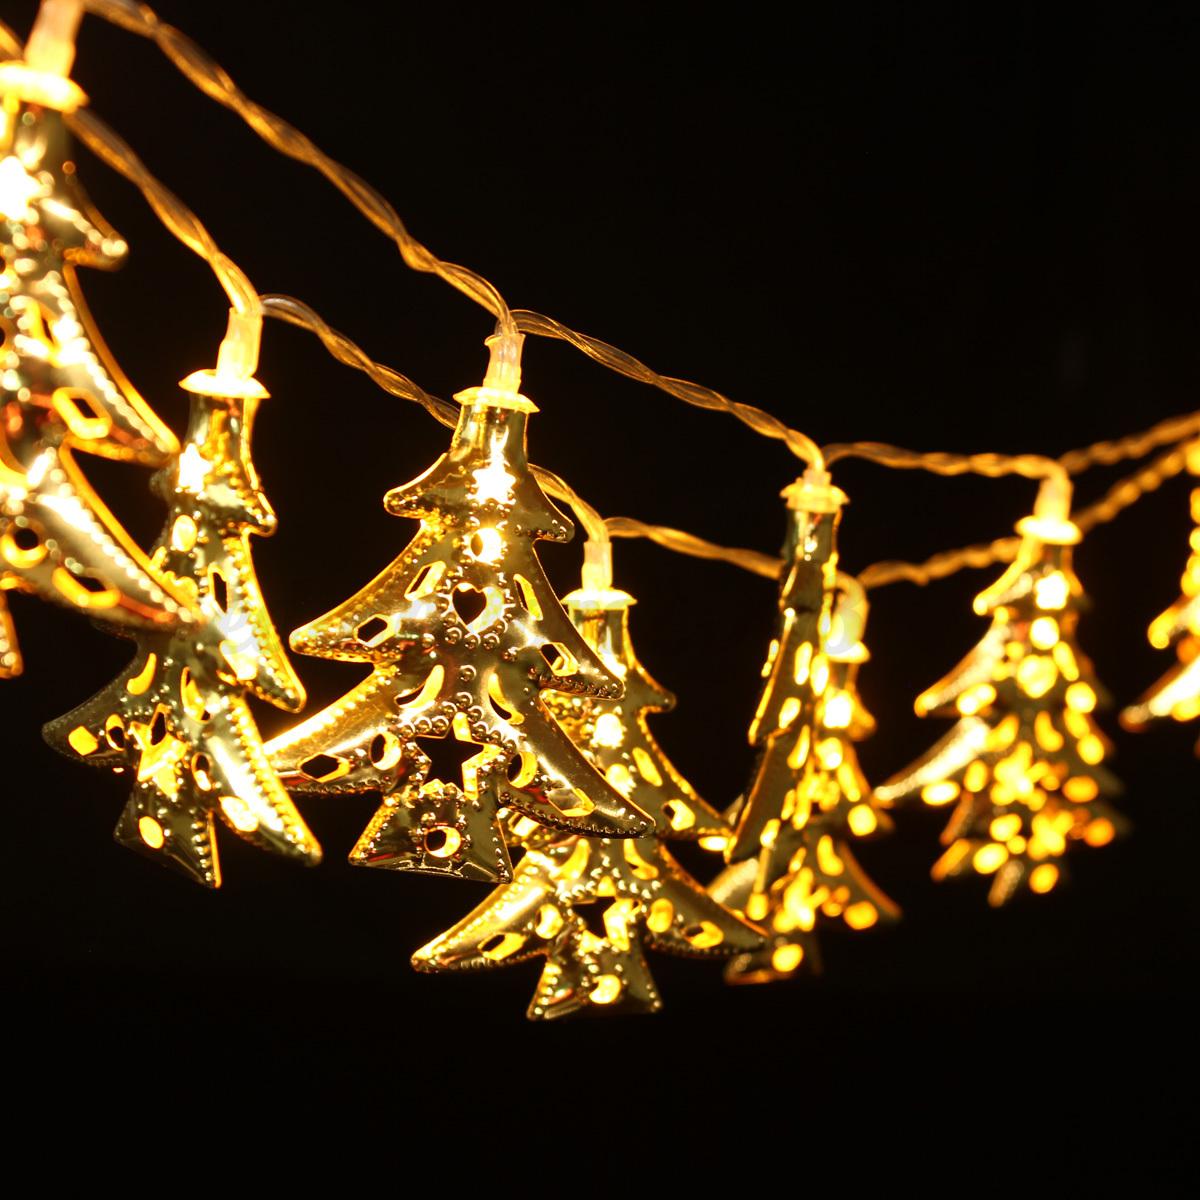 warm white christmas wedding xmas party decor outdoor string fairy light lamp ebay. Black Bedroom Furniture Sets. Home Design Ideas